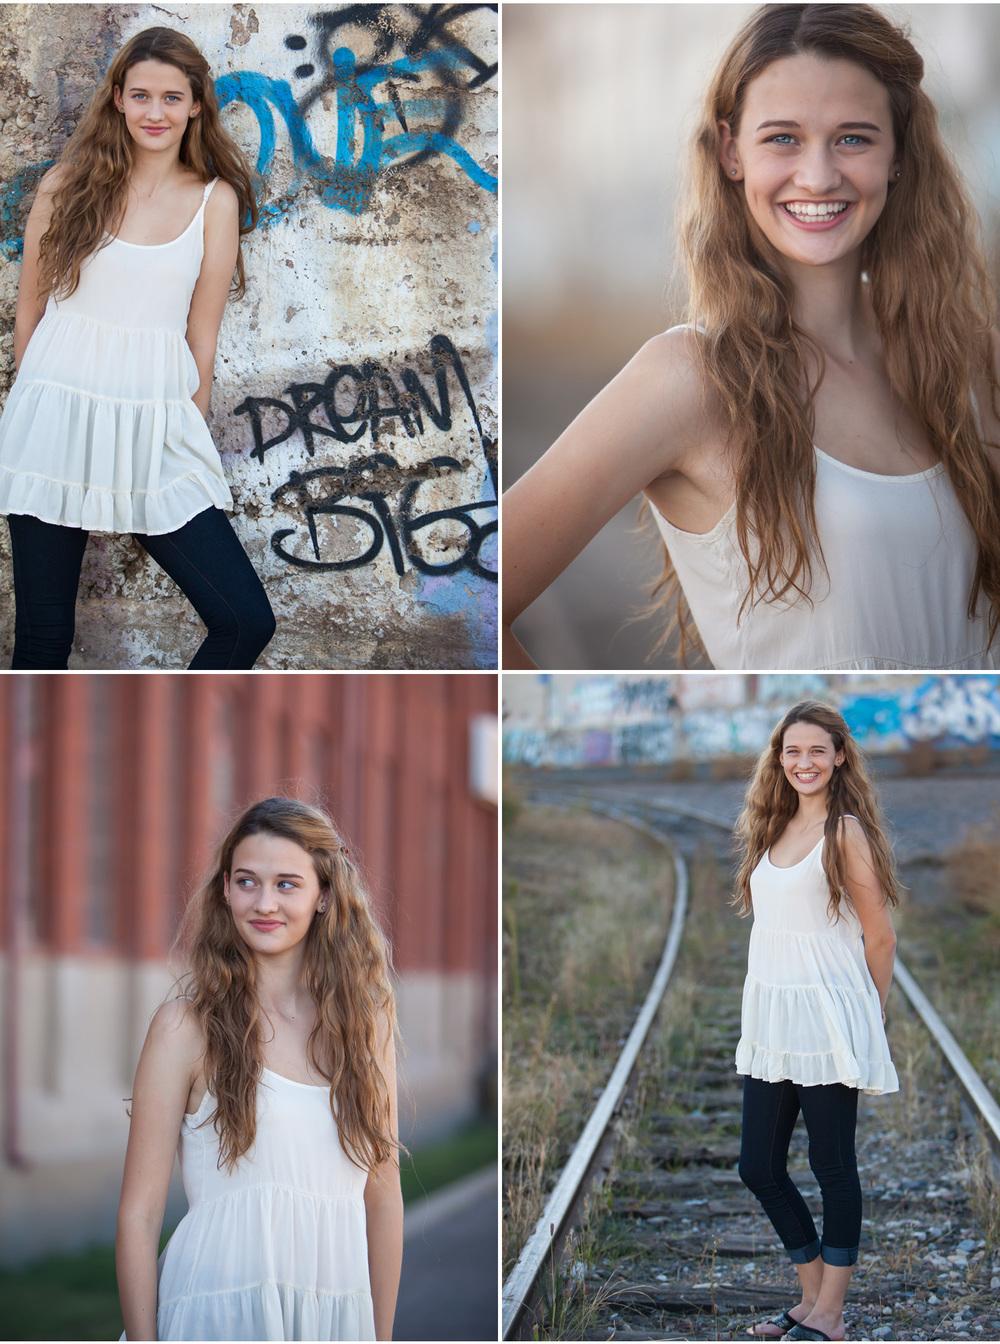 high school senior pictures in denver with historic factory, graffiti and traintracks | photographer jennifer koskinen | merritt portrait studio